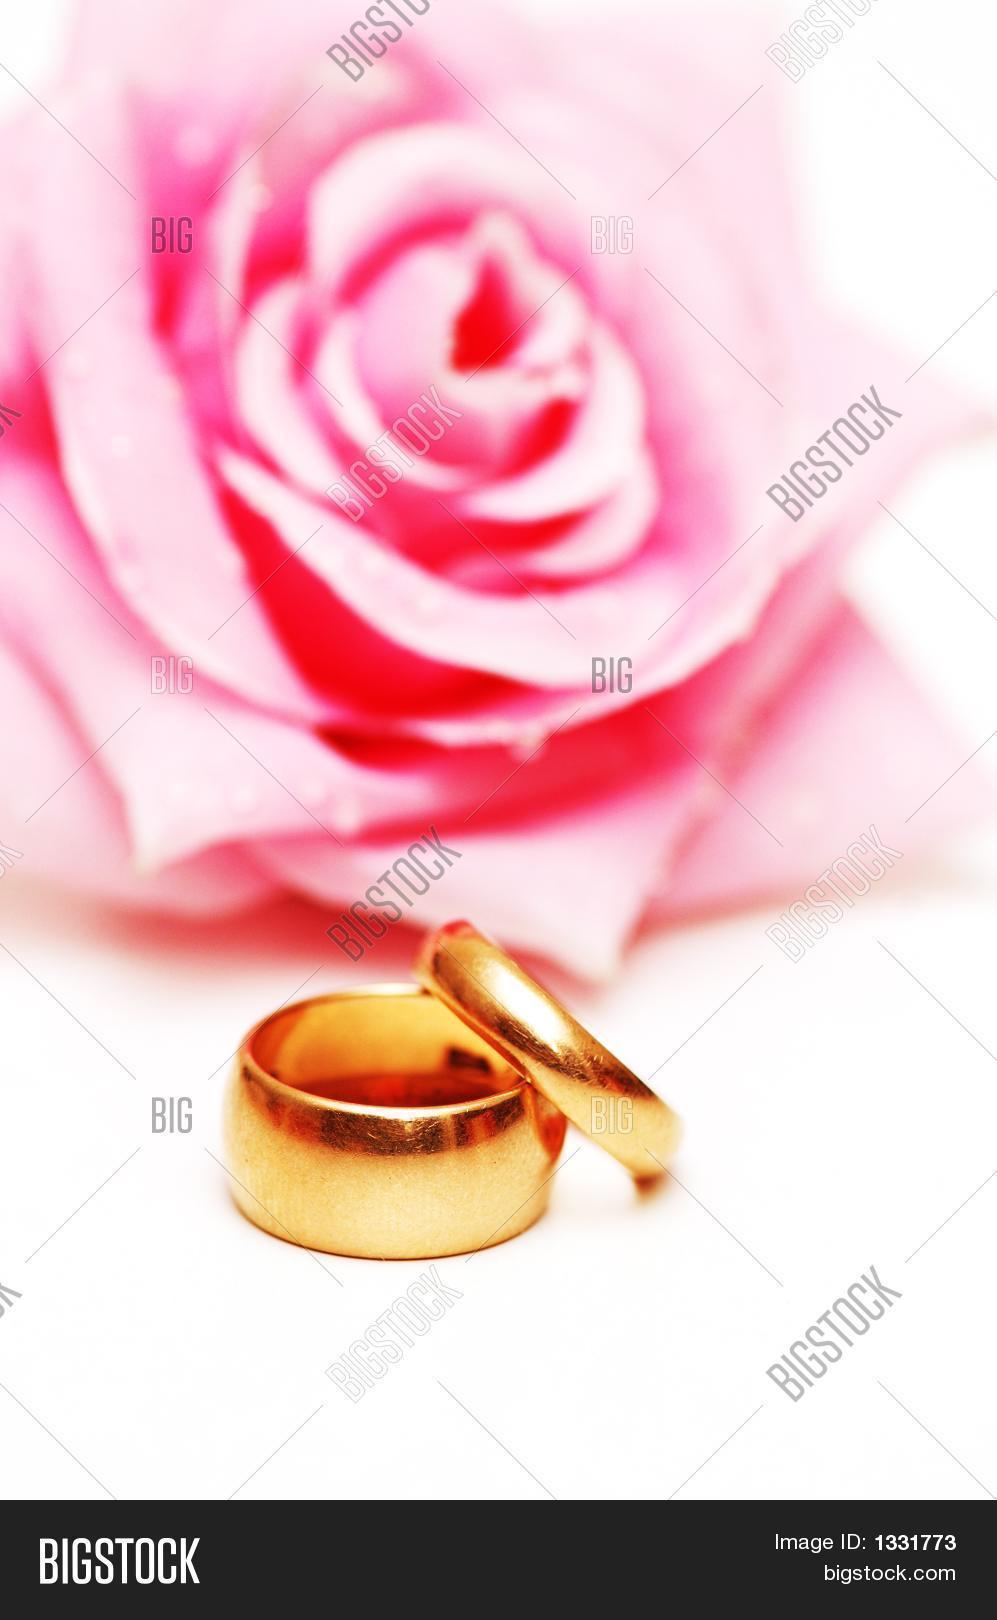 Two Wedding Rings Pink Image & Photo (Free Trial) | Bigstock